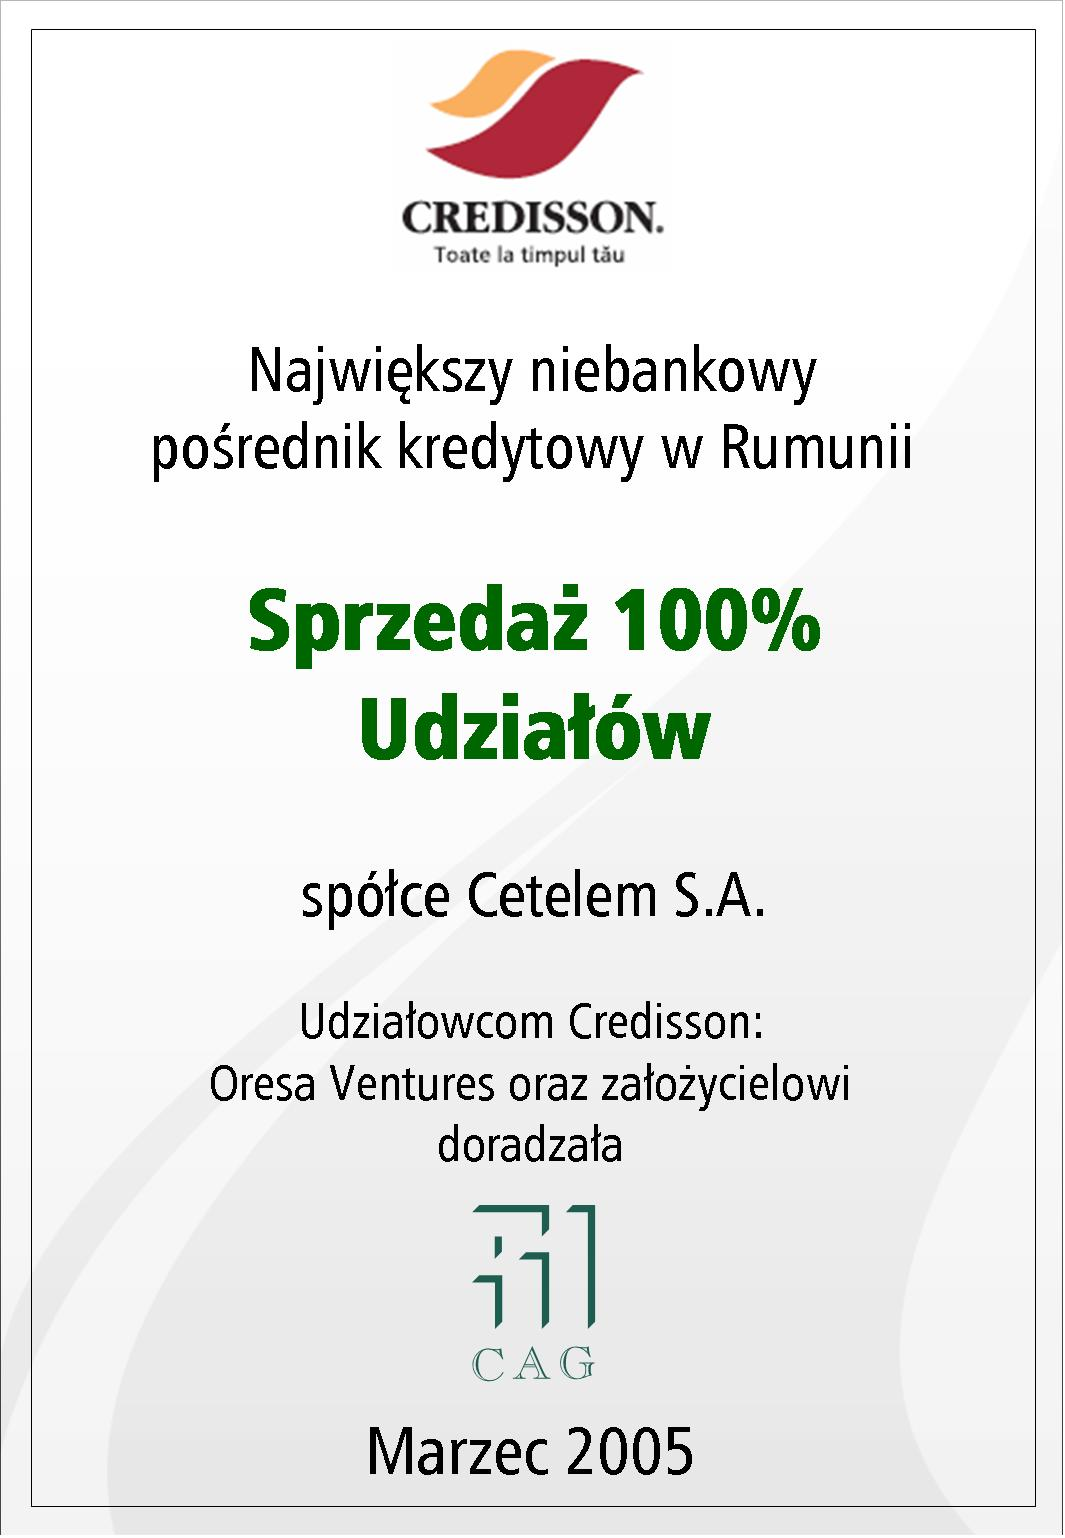 Credisson